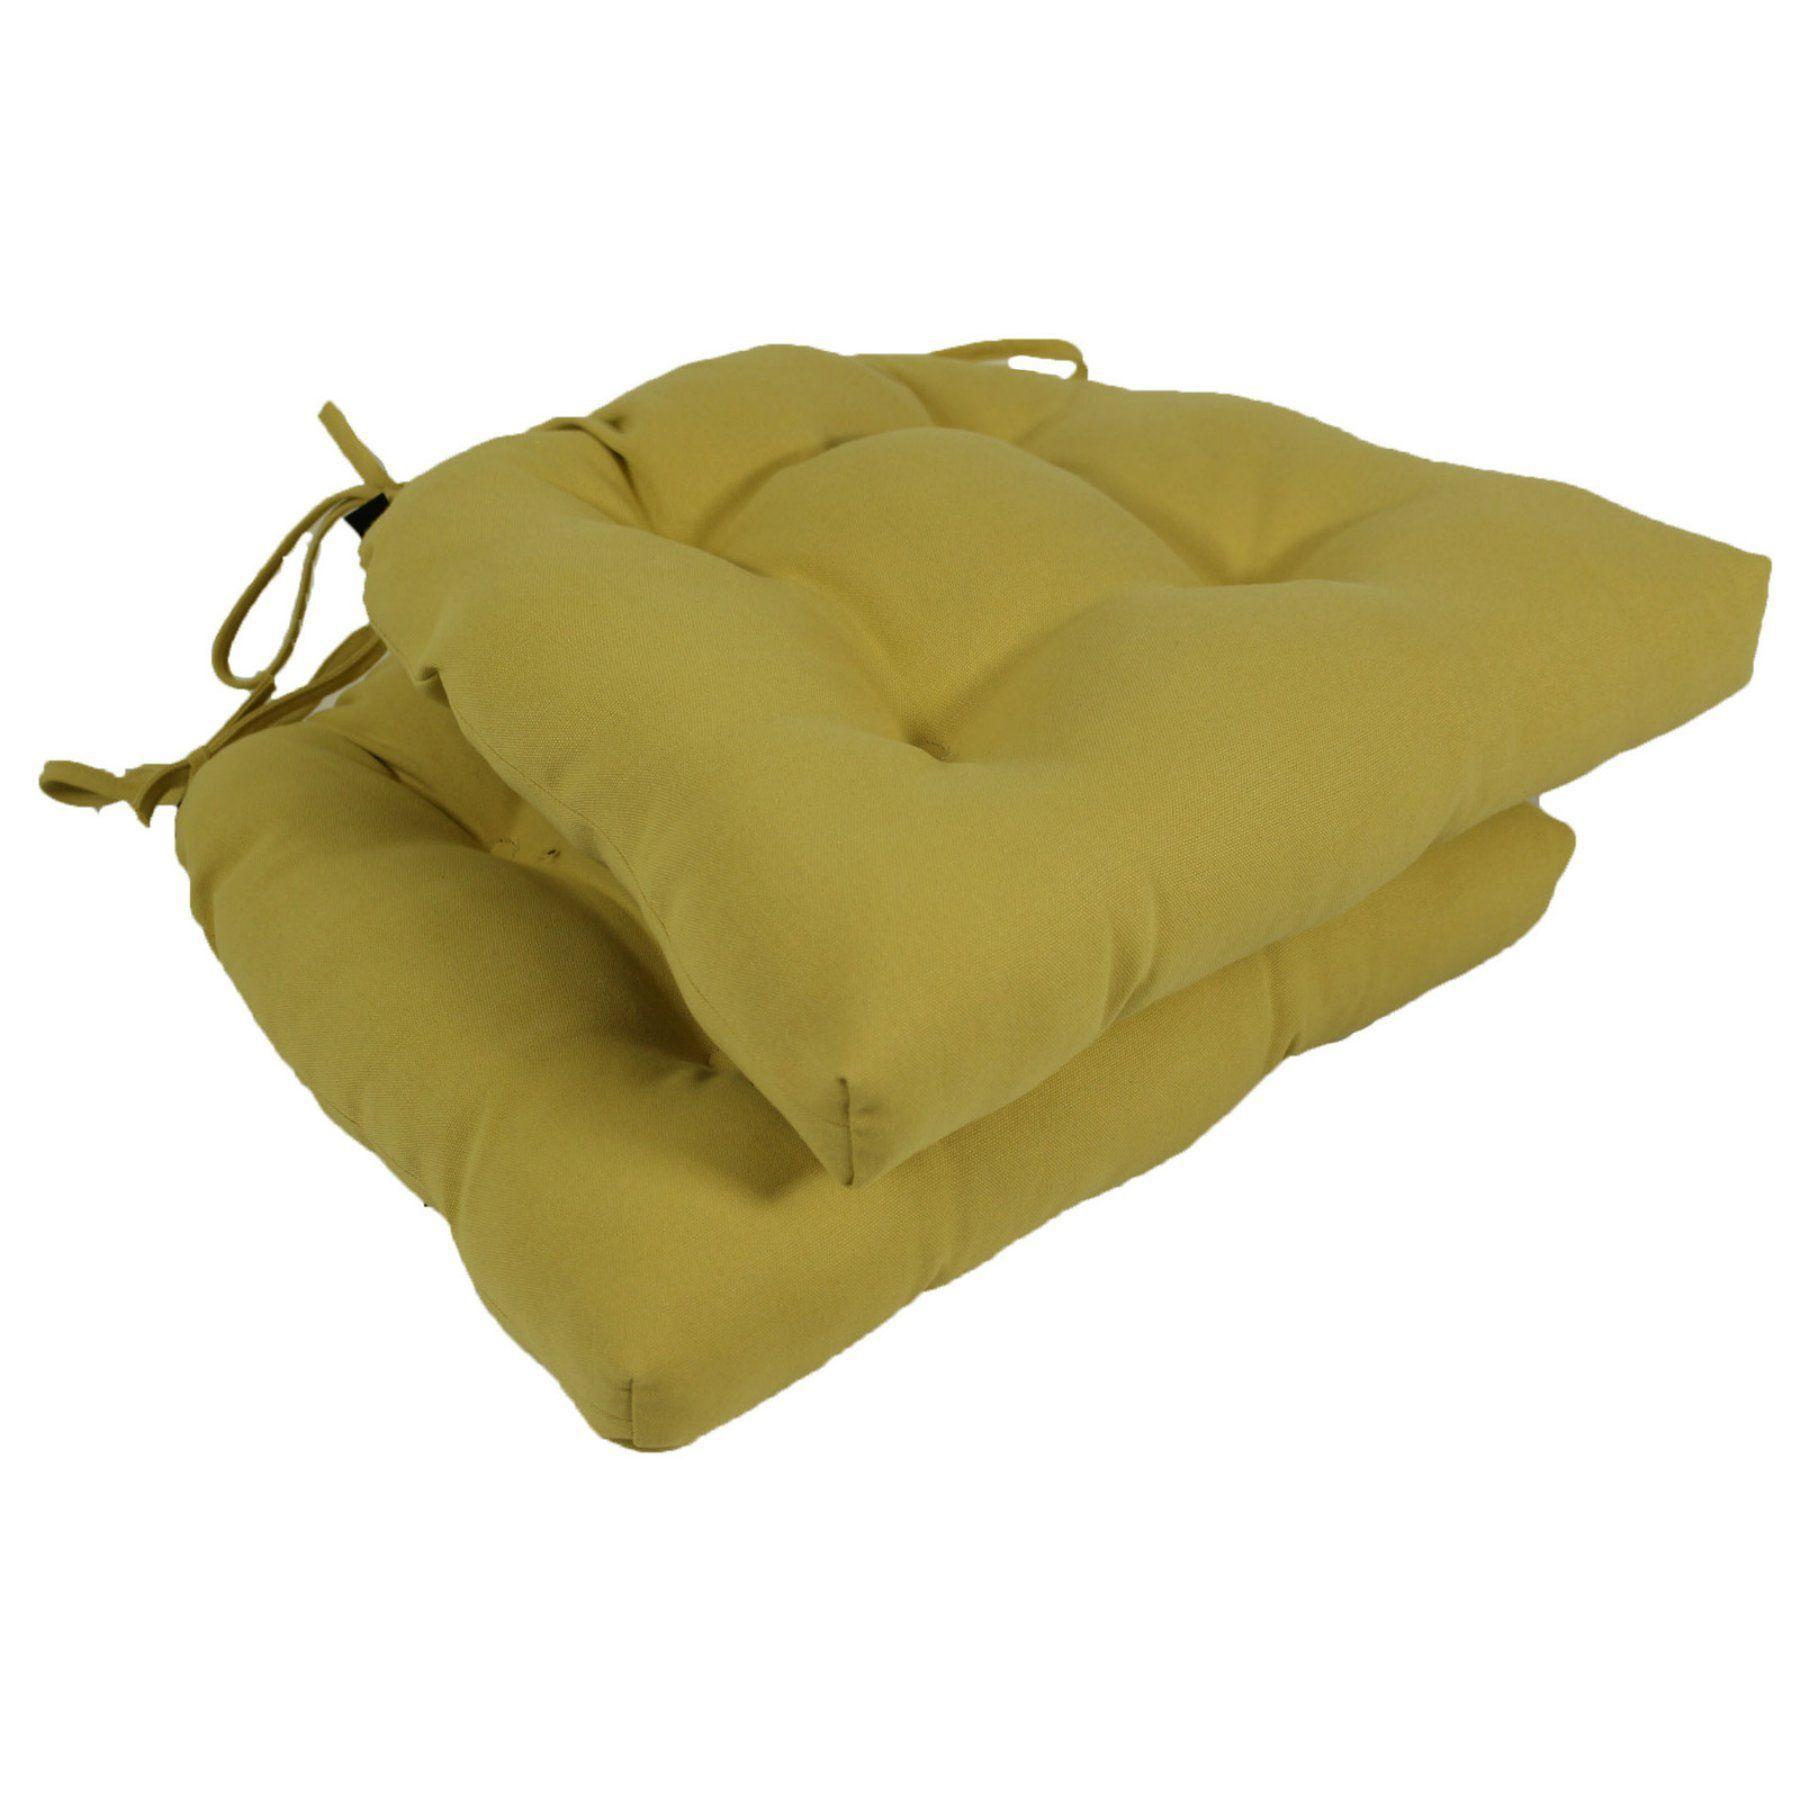 Lava WHS Honey Sunbrella Outdoor U Chair Cushions with Ties - Set of 2 - LAVA388-0018